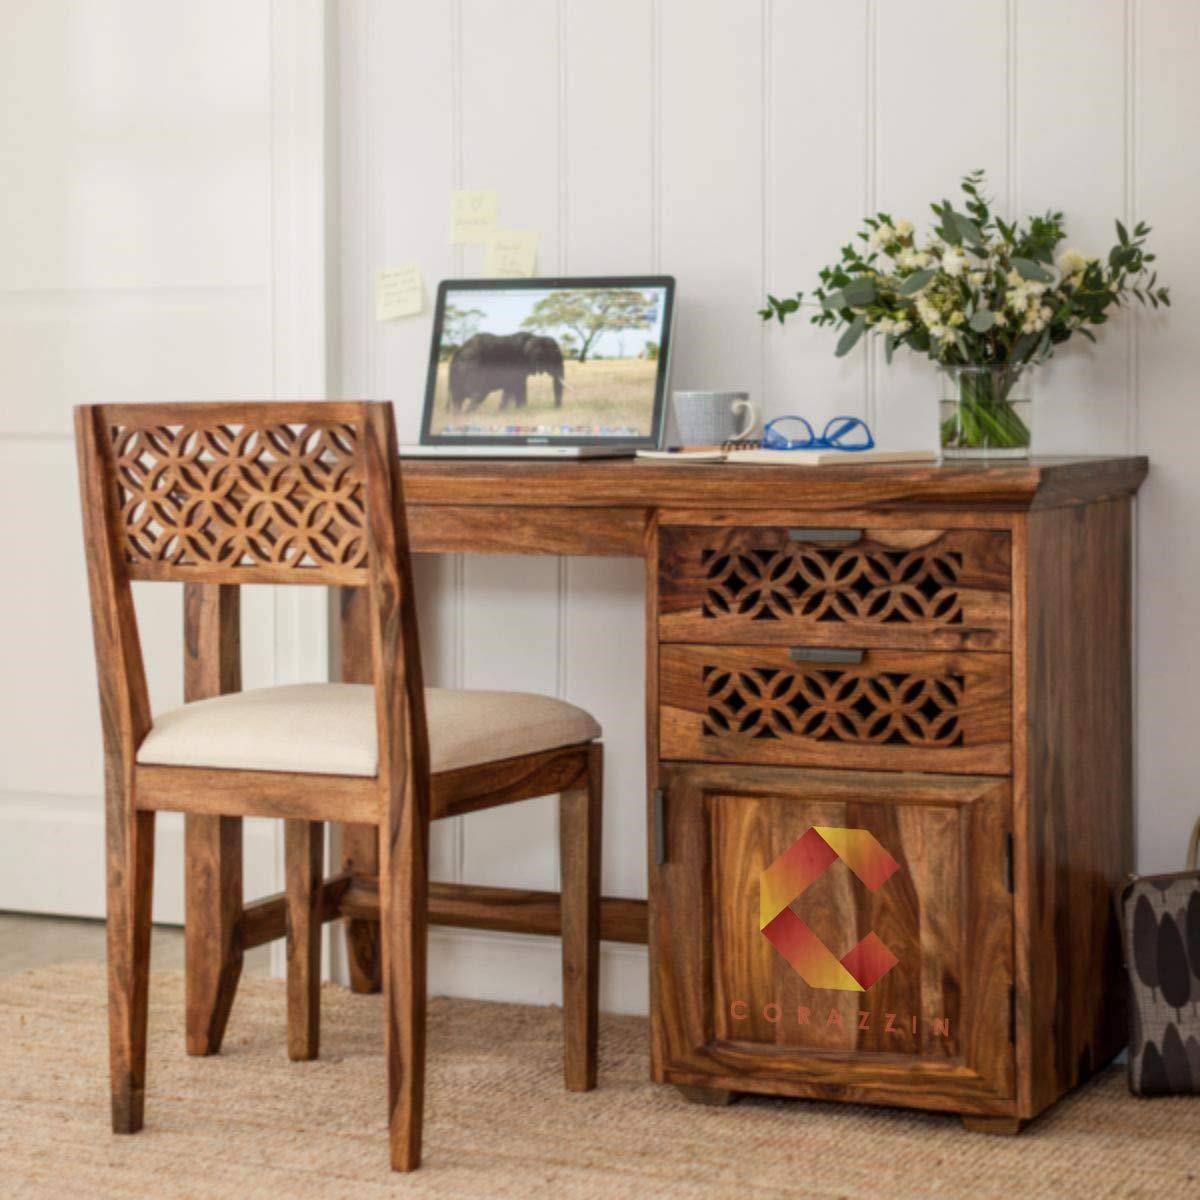 Corazzin Furniture Sheesham Wood Study Table for ₹14,240